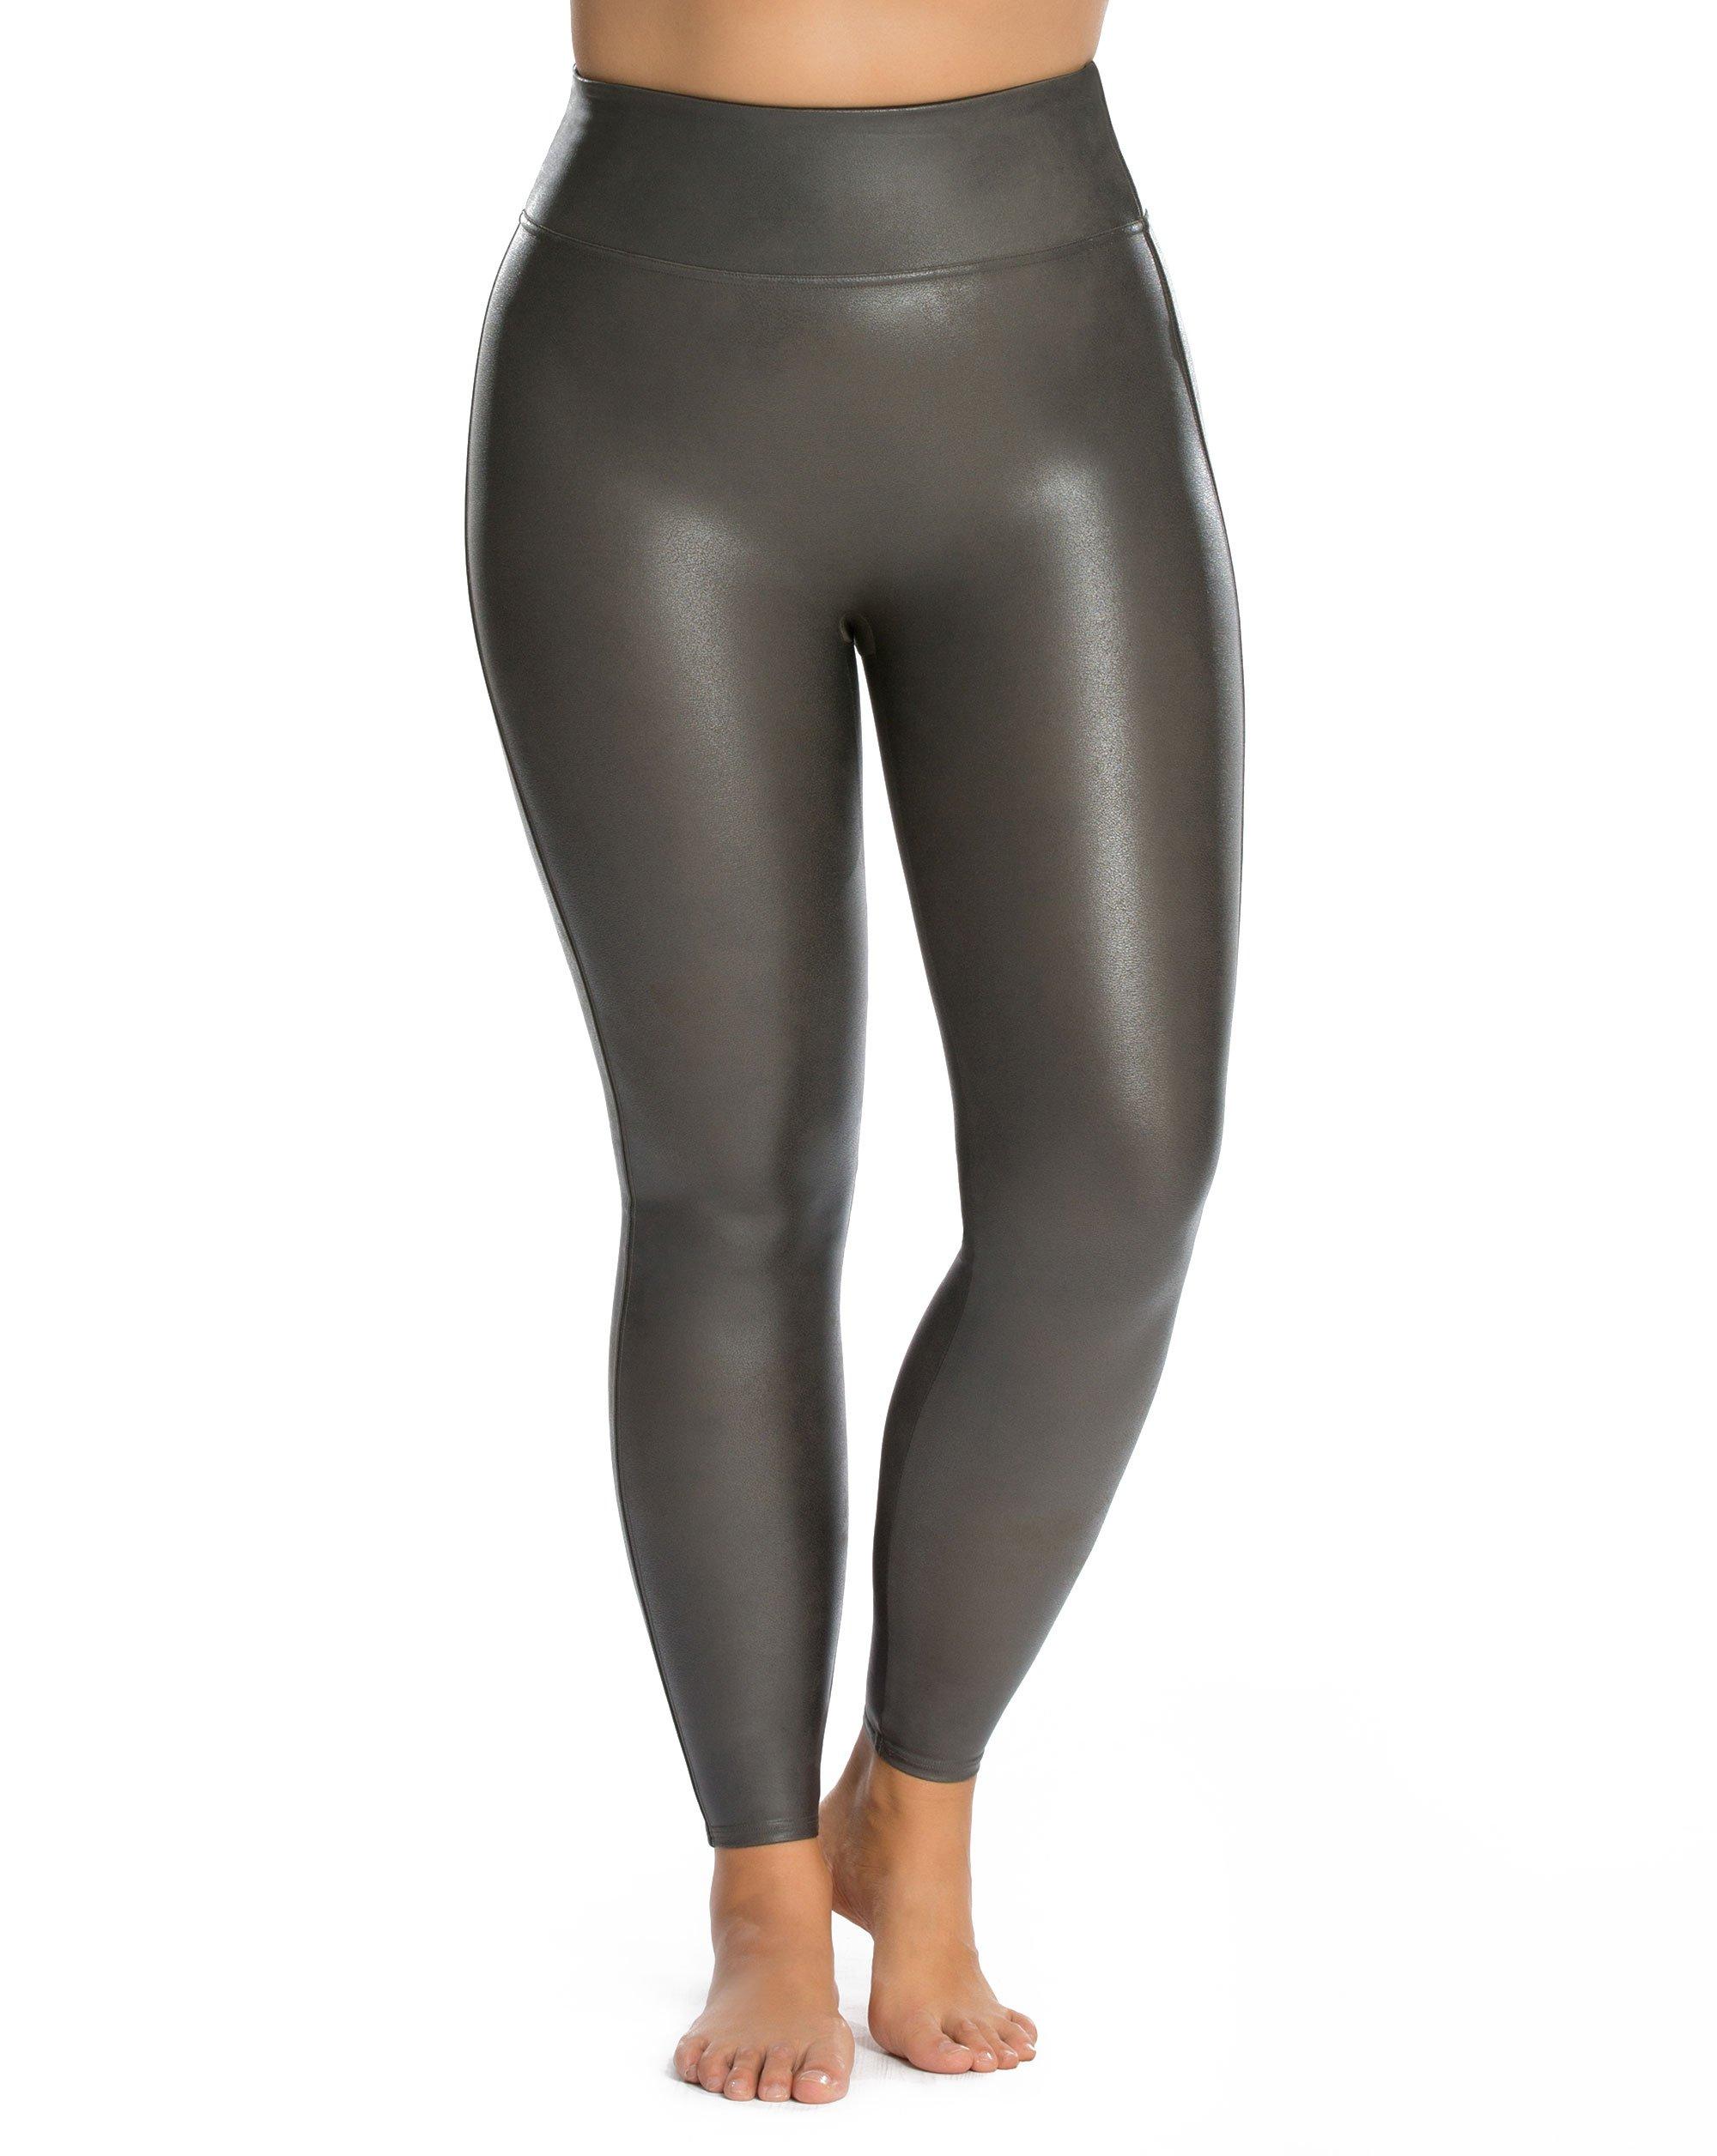 SPANX Plus Size Ready-to-Wow Faux Leather Leggings, 1X, Gunmetal